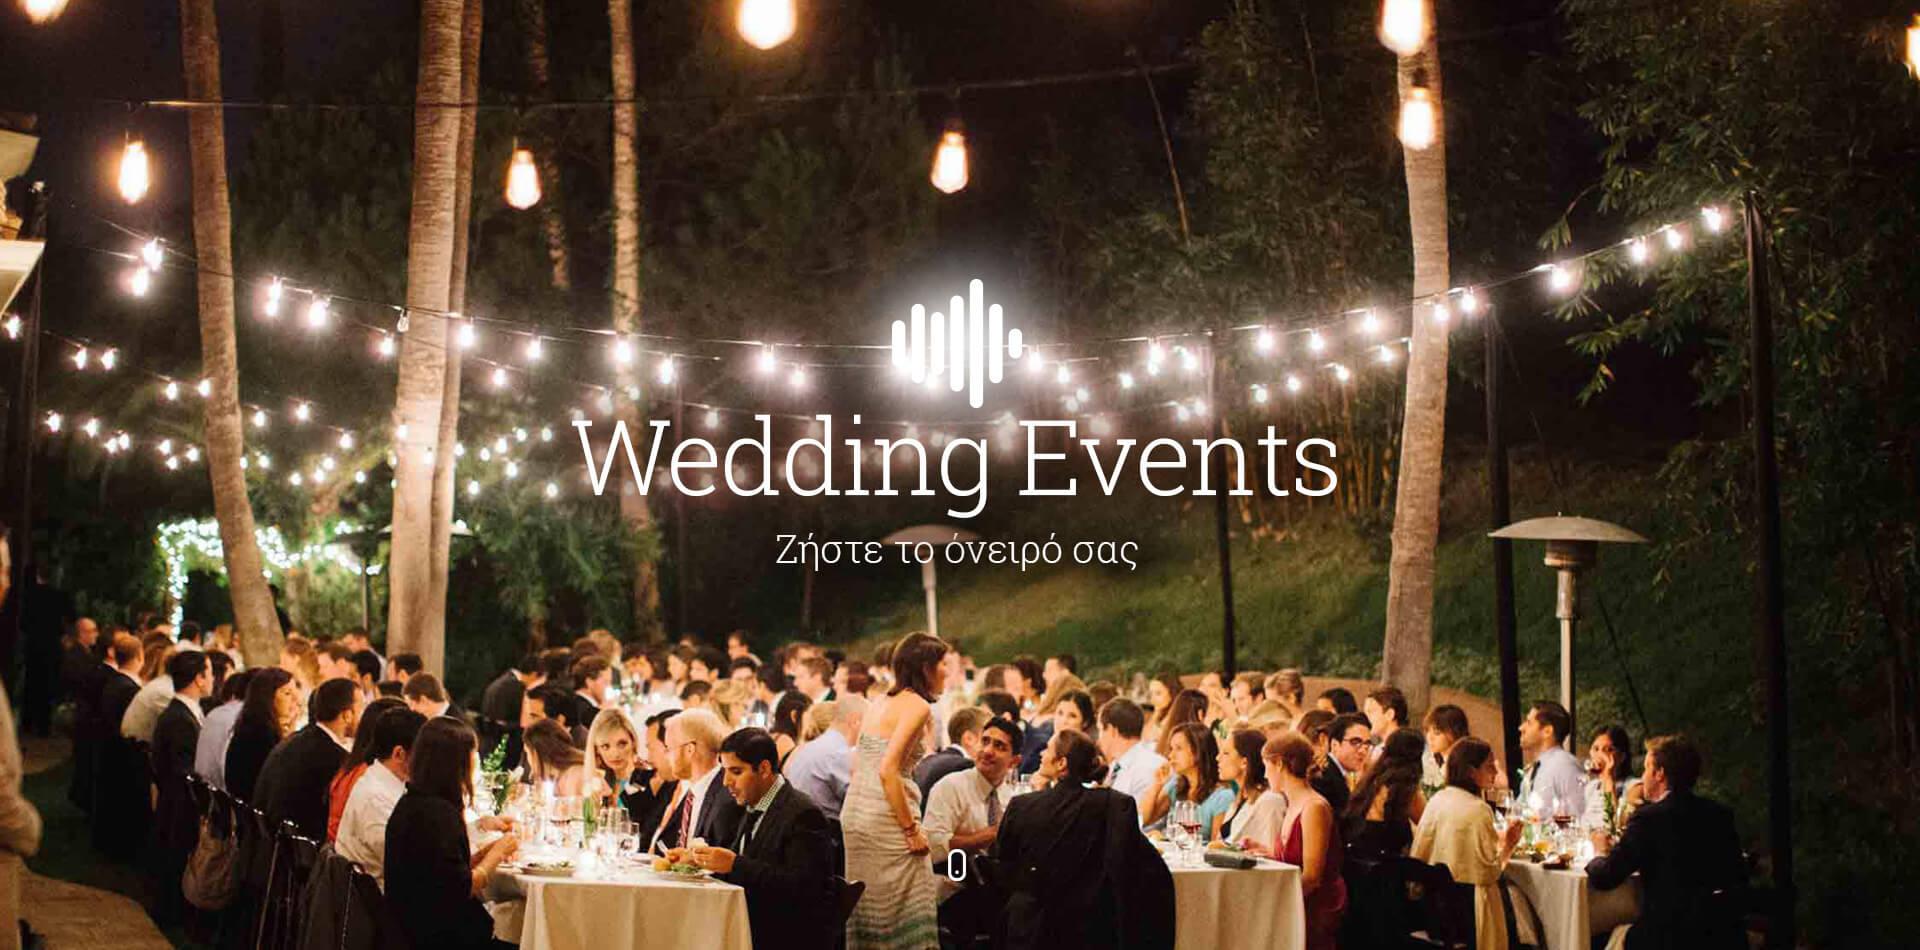 WEDDING-NEW2-EVENTS